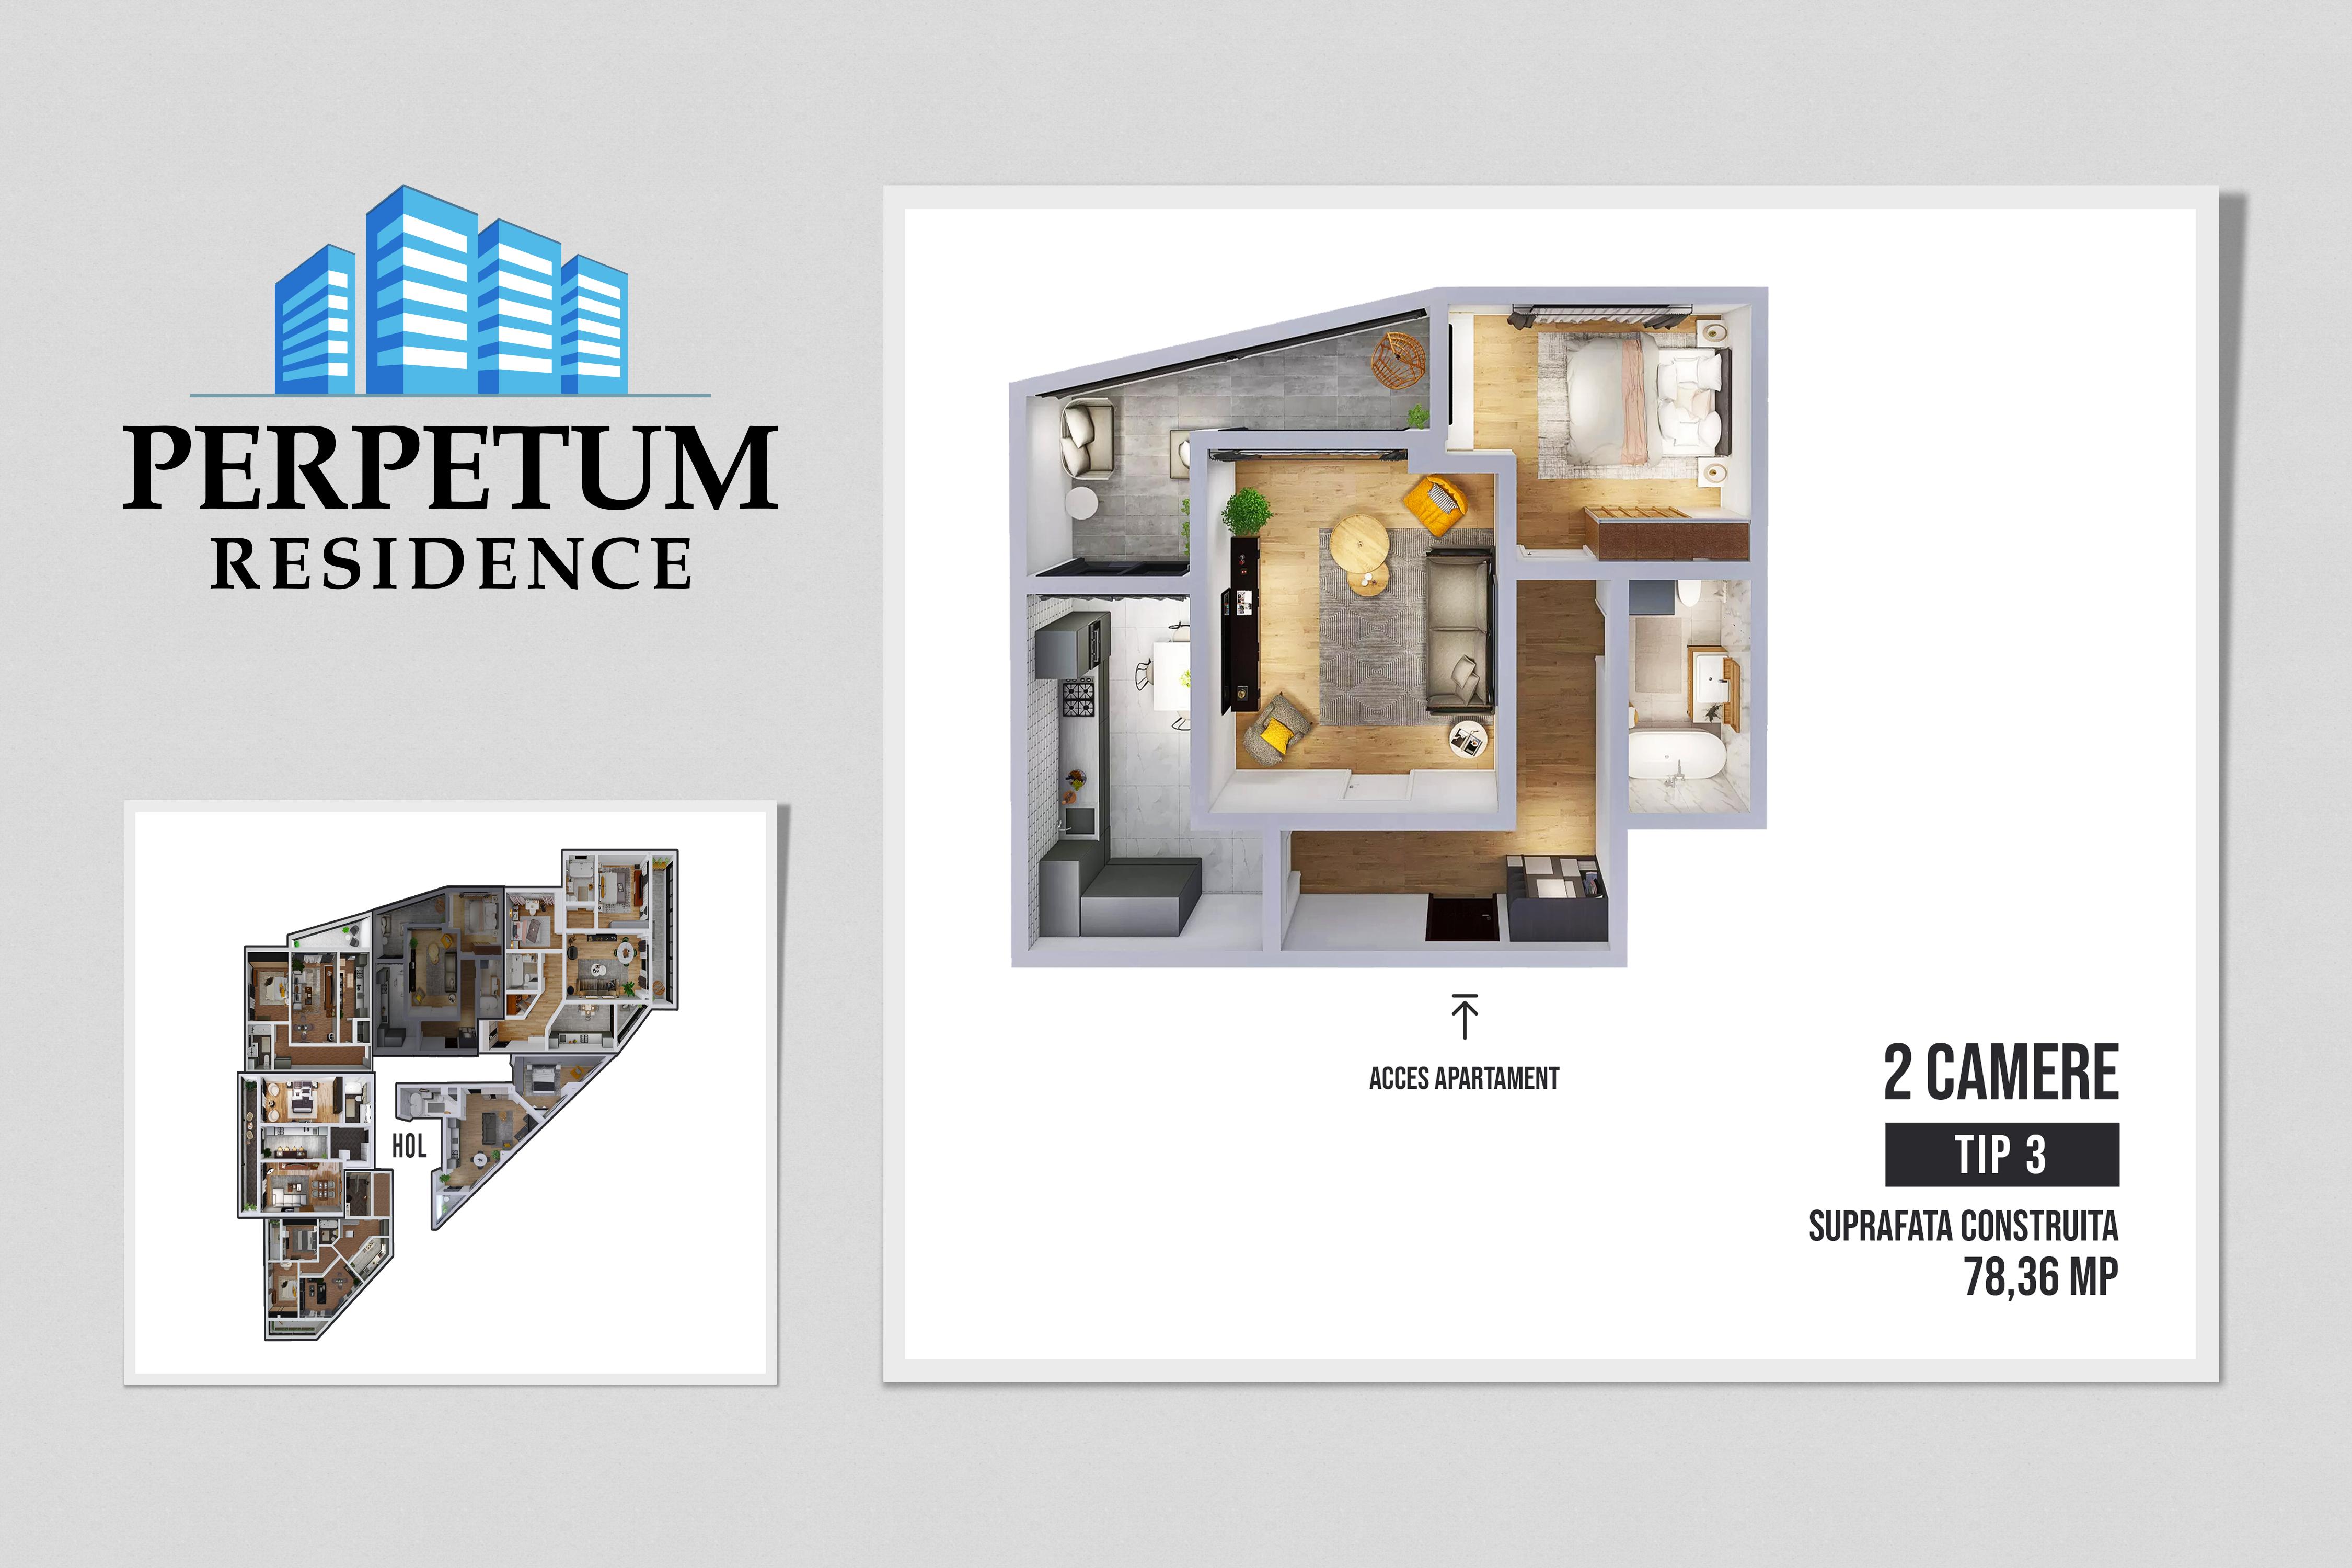 DIRECT DEZVOLTATOR! COMISION 0% Tomis Nord - Apartament cu 2 camere TIP 3 in Complex Perpetum Residence II